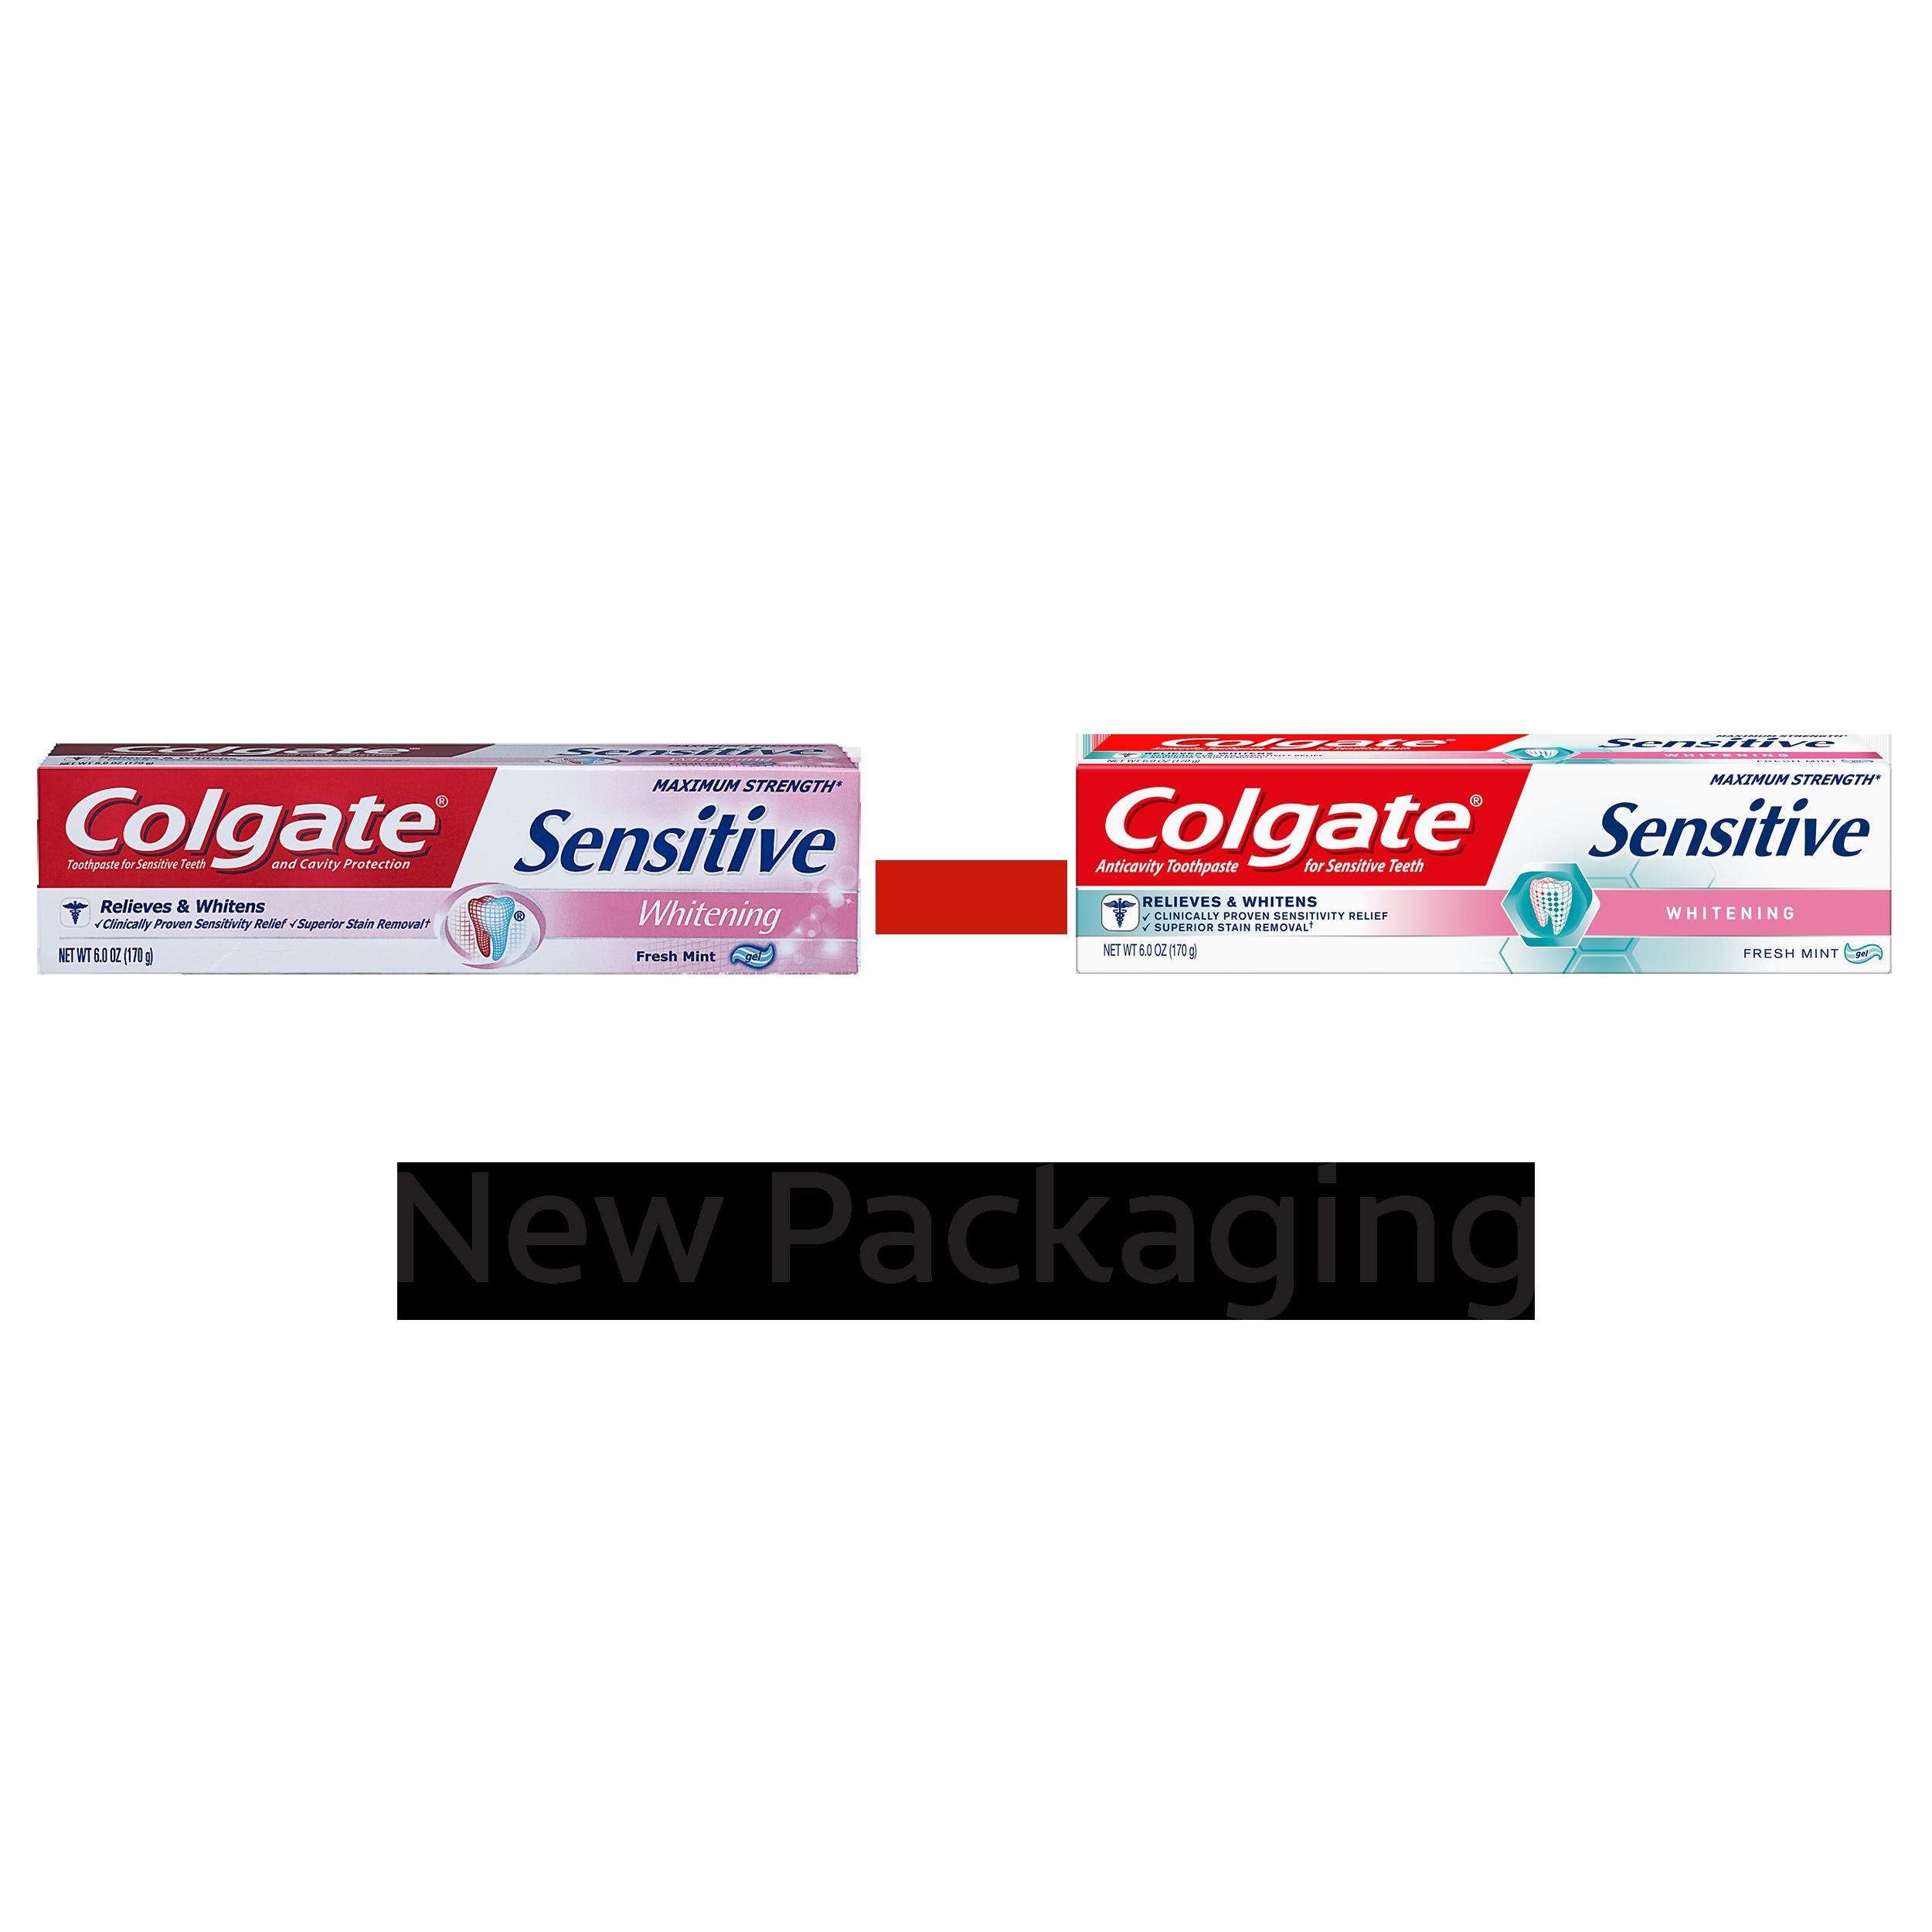 Colgate Sensitive Maximum Strength Whitening Toothpaste 6 Oz Twin Cavity Protection Fresh Cool Mint Pasta Gigi 180g 4 Pcs Pack